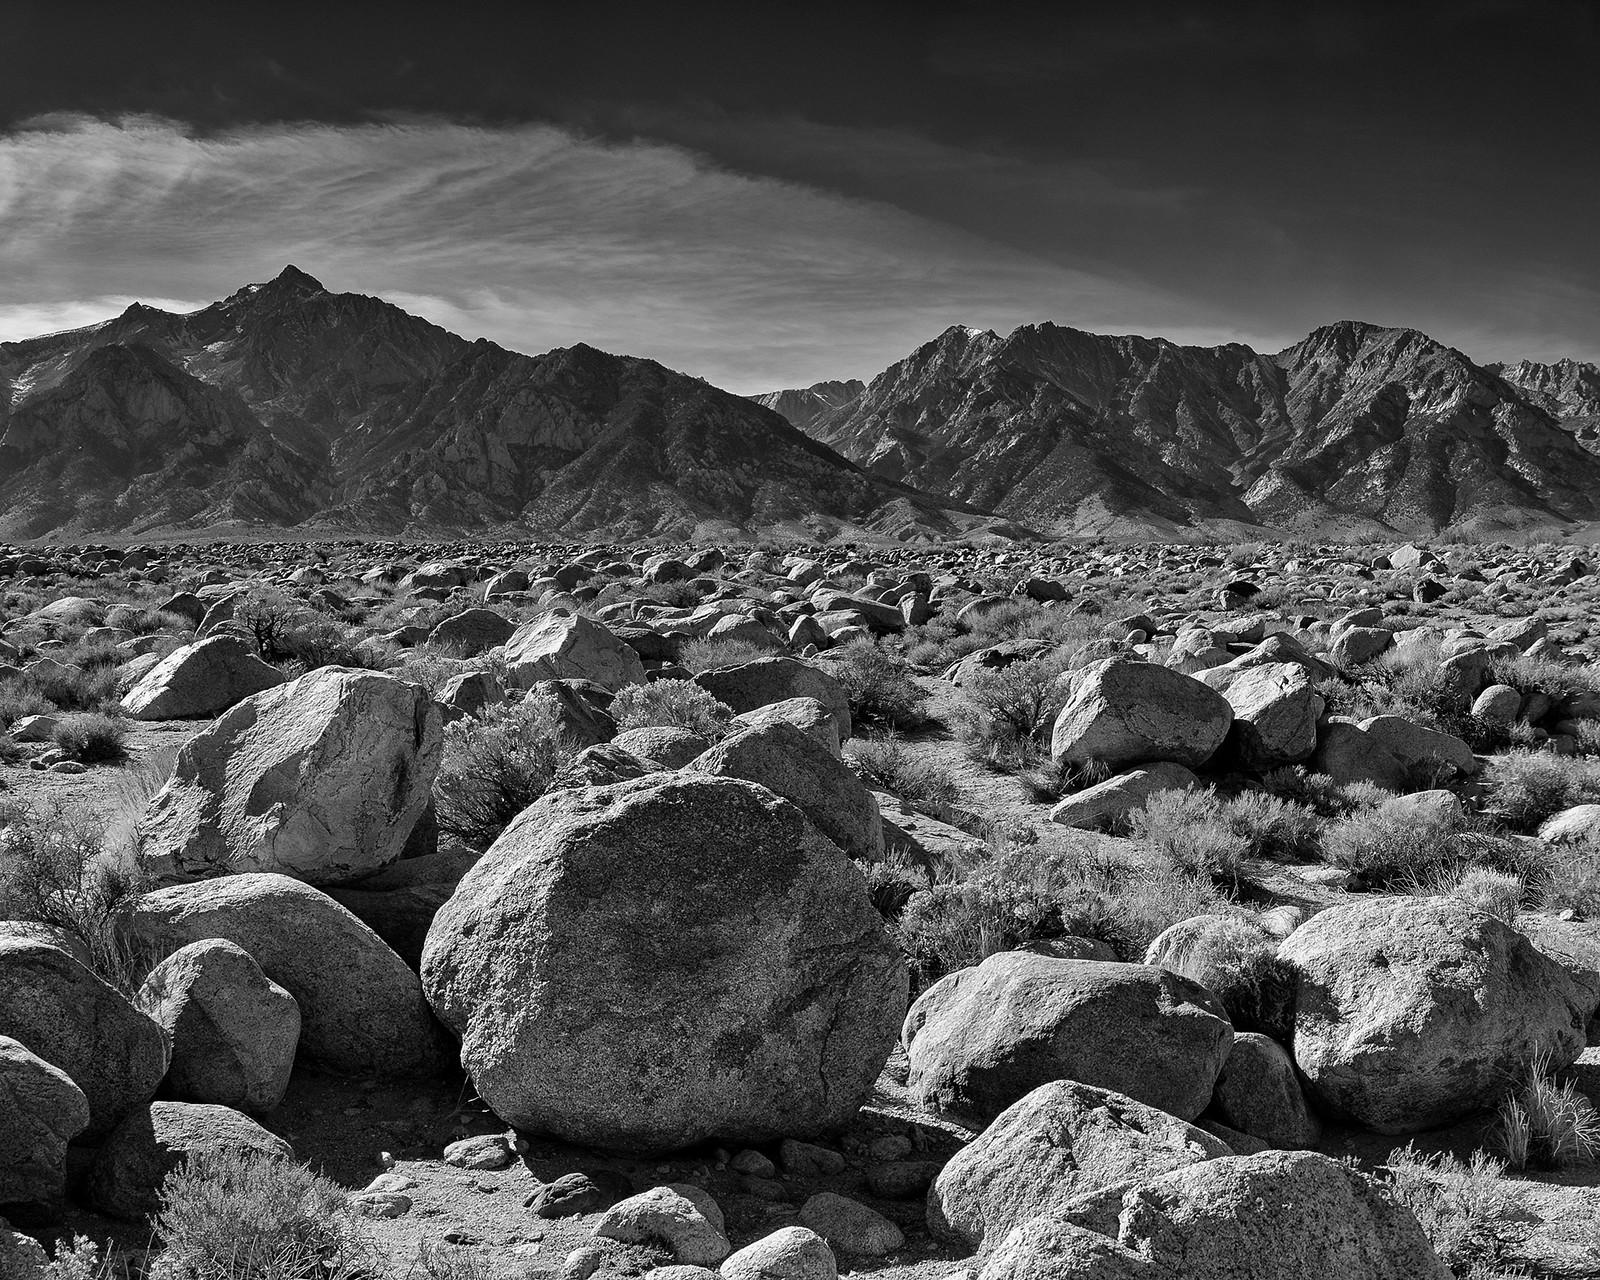 ansel's spot. manzanar, ca. 2014. | by eyetwist